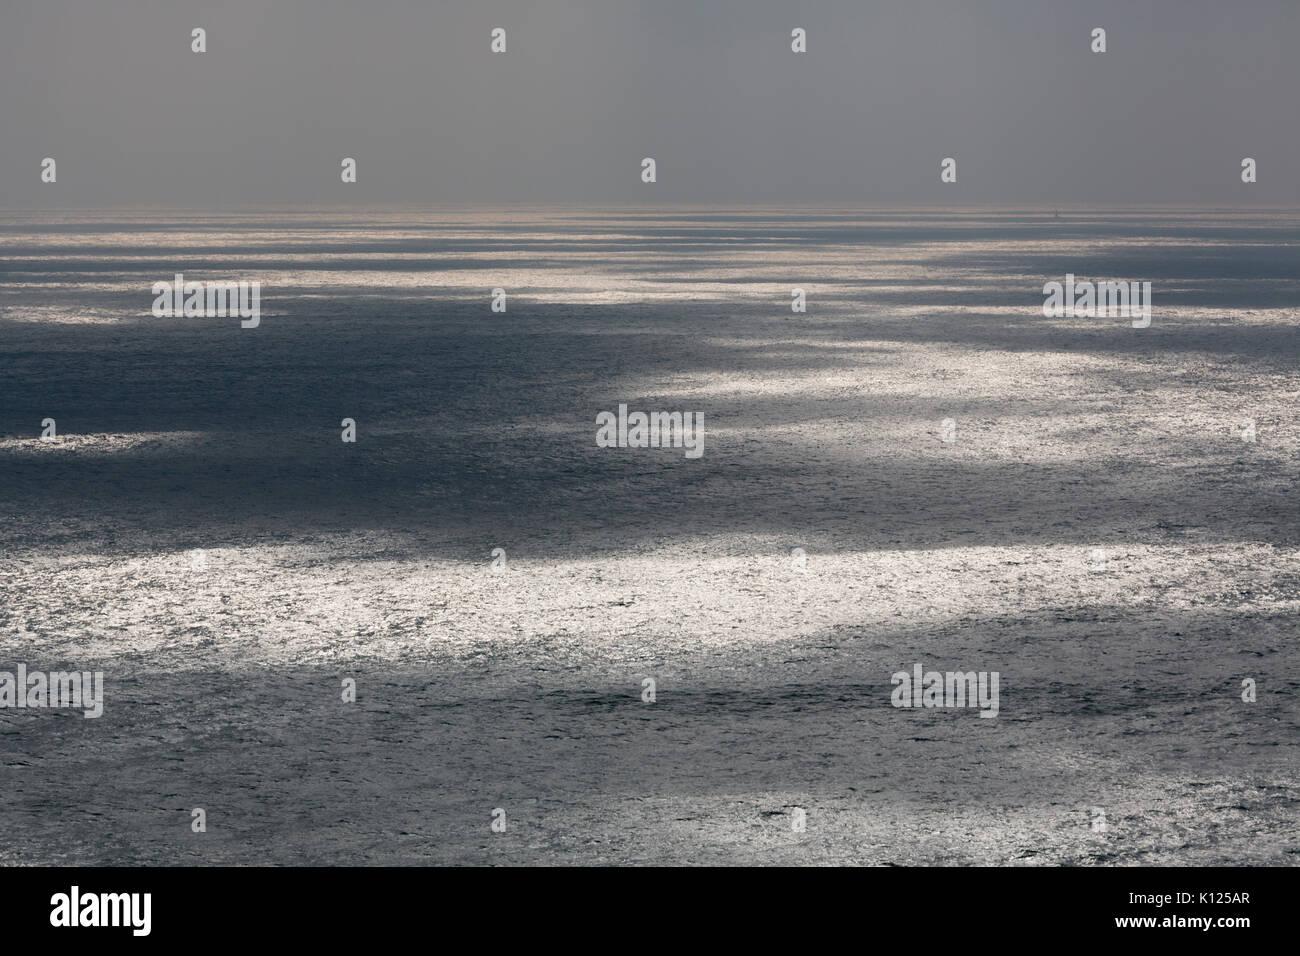 Patrones de luces en el mar; uk Imagen De Stock